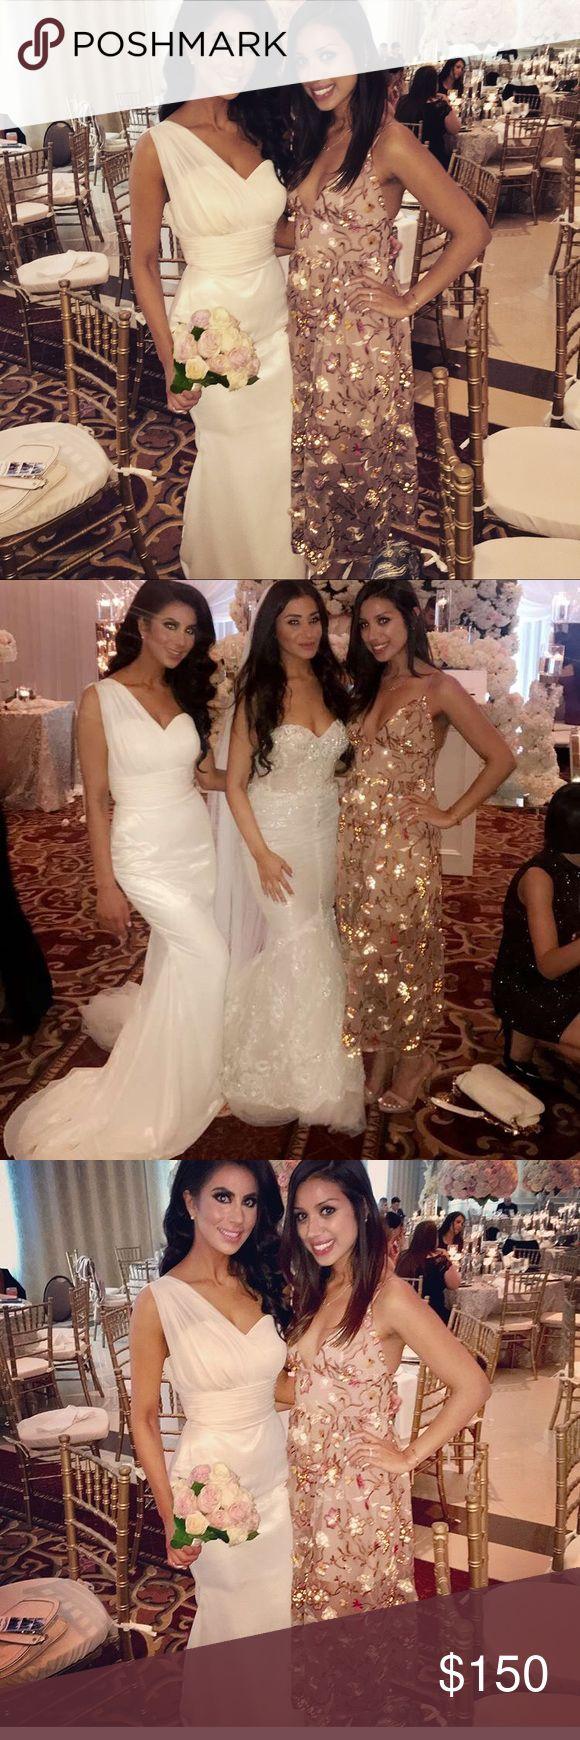 The 25 best cream bridesmaid dresses ideas on pinterest cream the 25 best cream bridesmaid dresses ideas on pinterest cream bridesmaids pale bridesmaid dresses and tan bridesmaid dresses ombrellifo Gallery